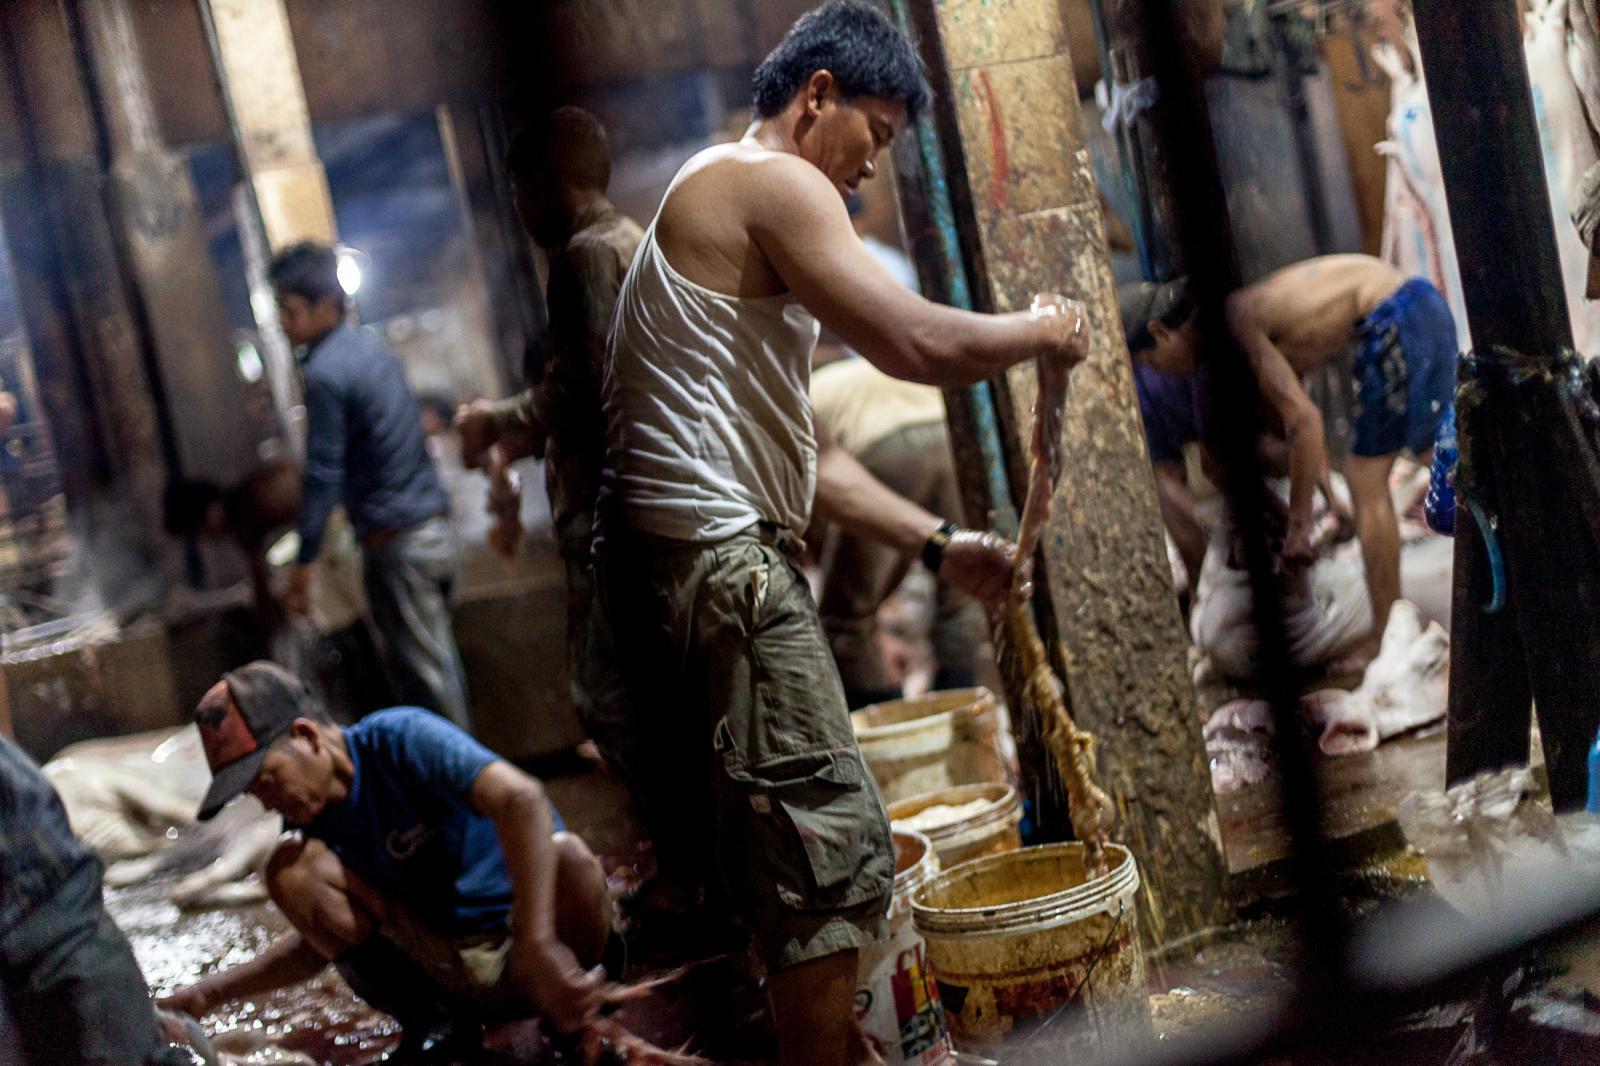 Photography image - Loading 003_Slaughterhouse-Cambodia-Omar-Havana.jpg